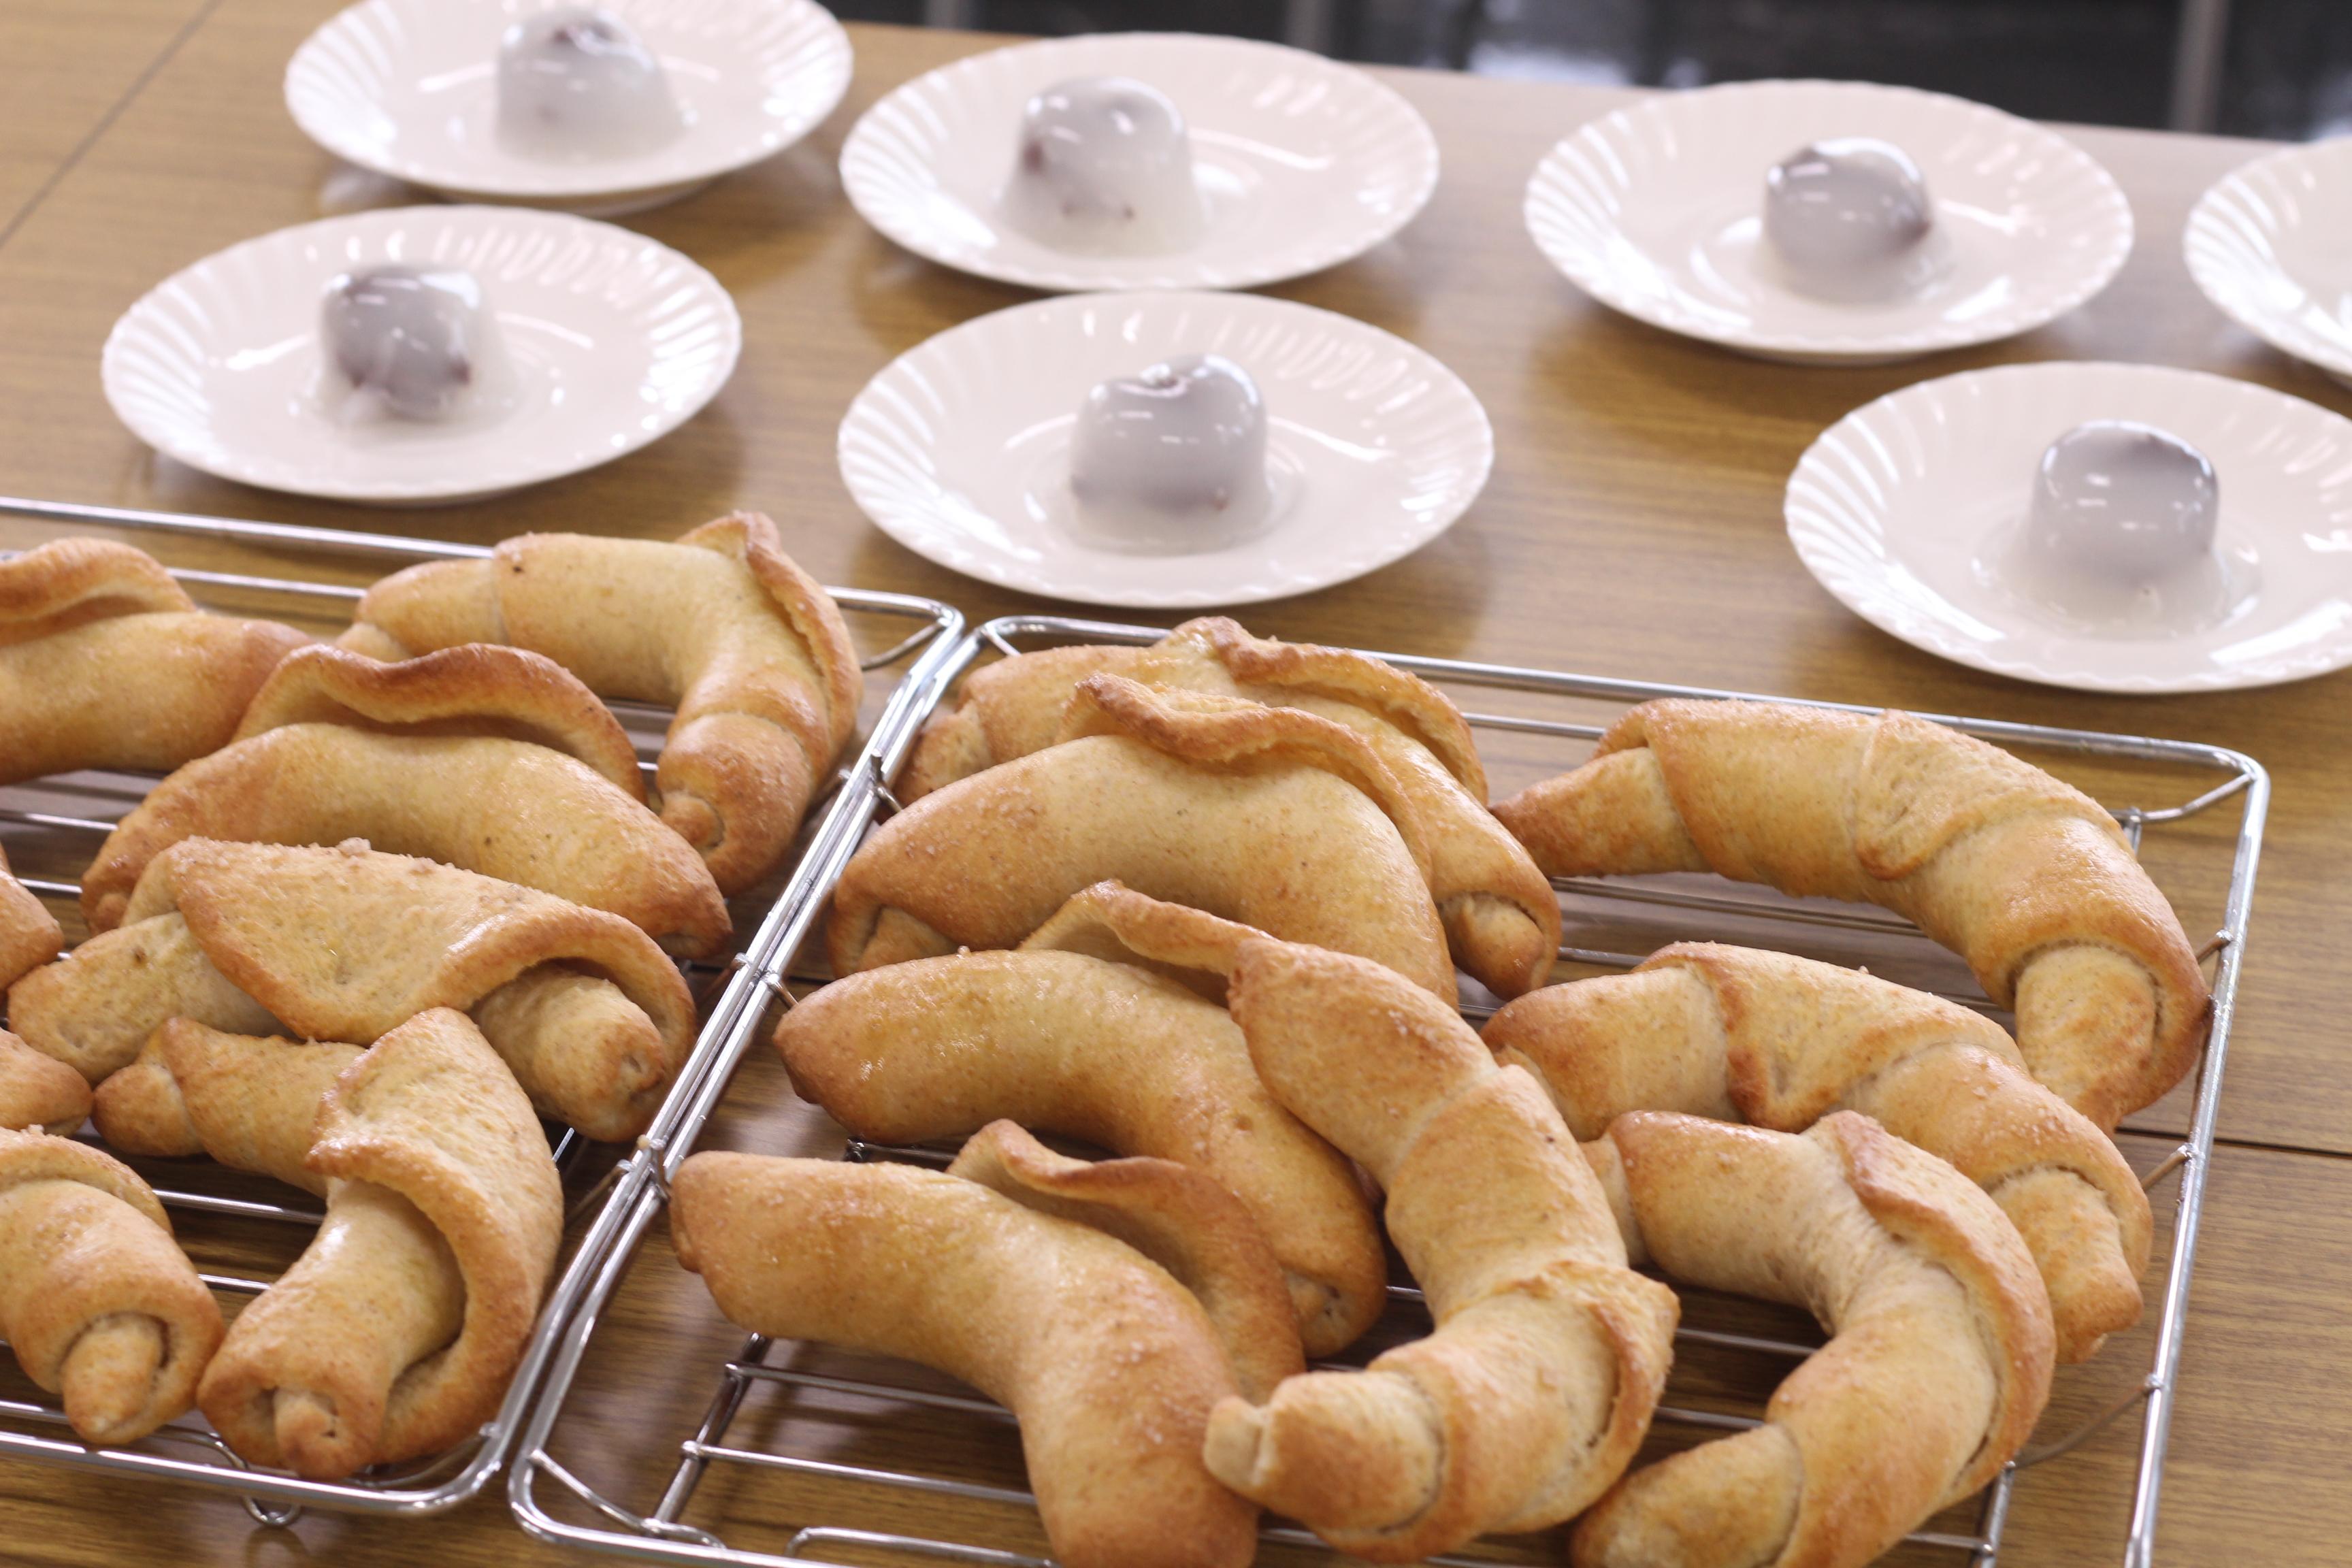 a-ta-sante糖質制限パン料理教室、阿倍野区西田辺会館でのレッスン、塩オリーブロールパン。